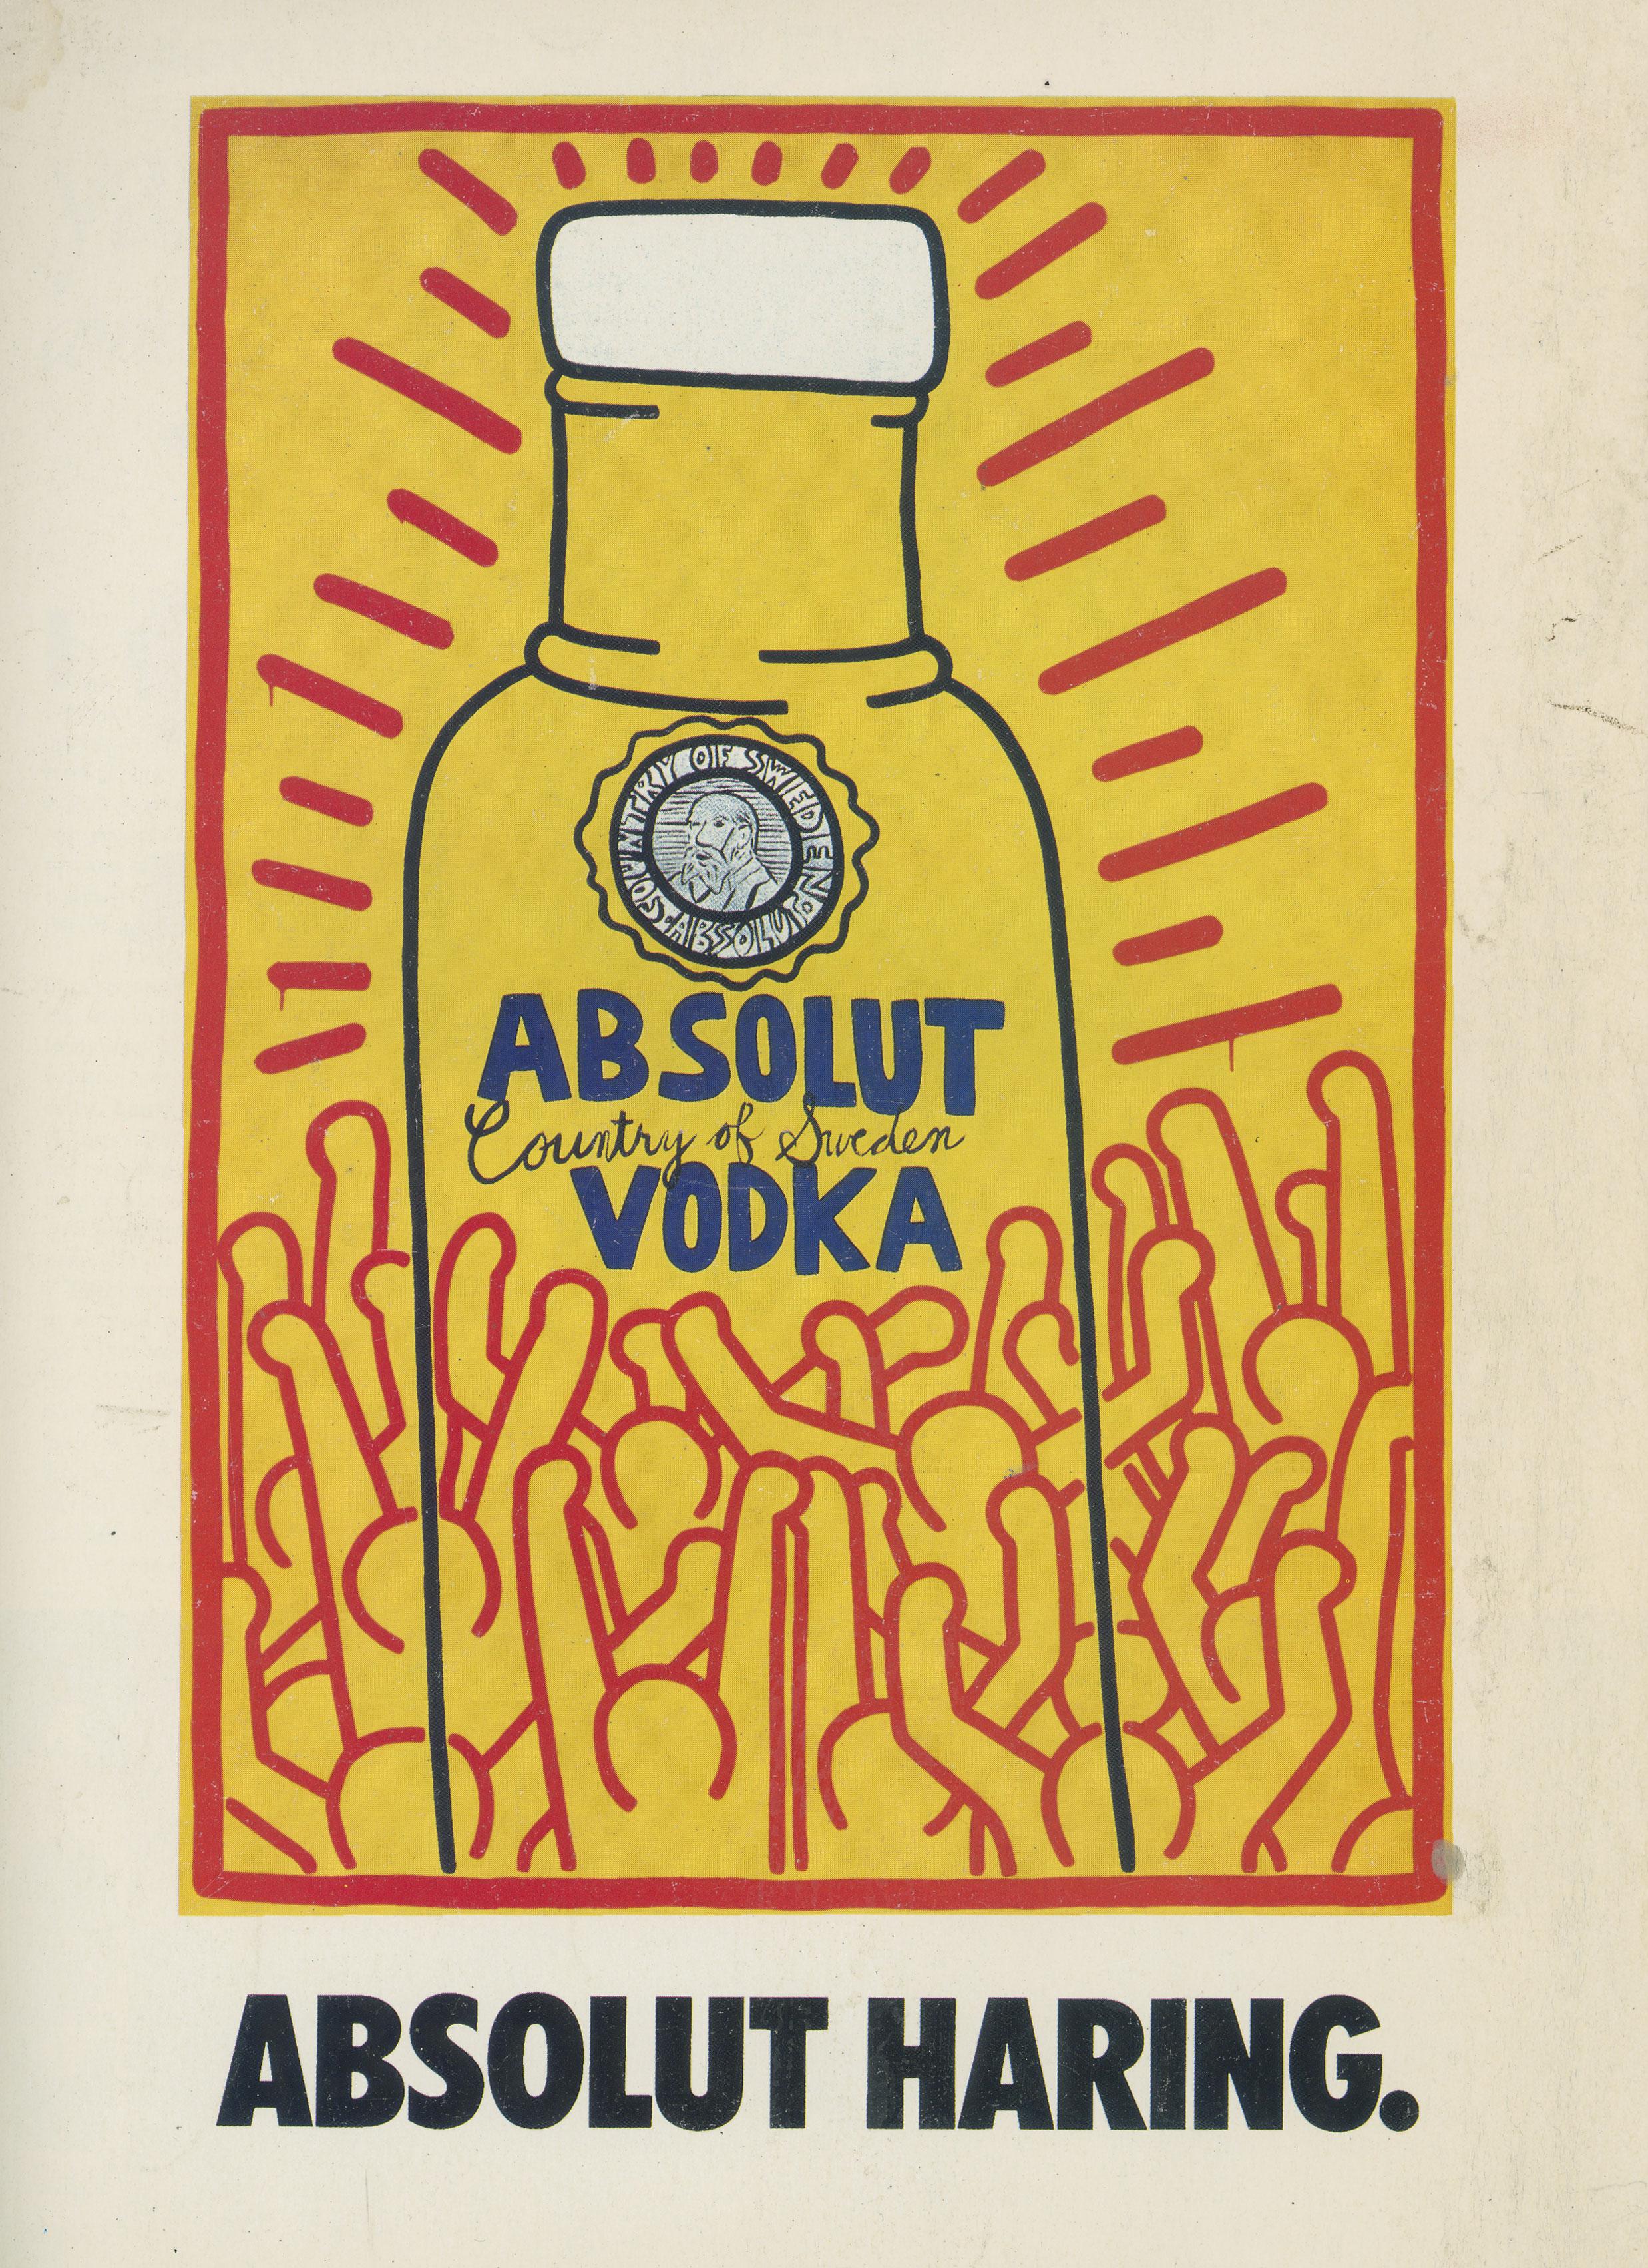 Keith Haring, Test Pressing, Absolut, Vodka, Advert,